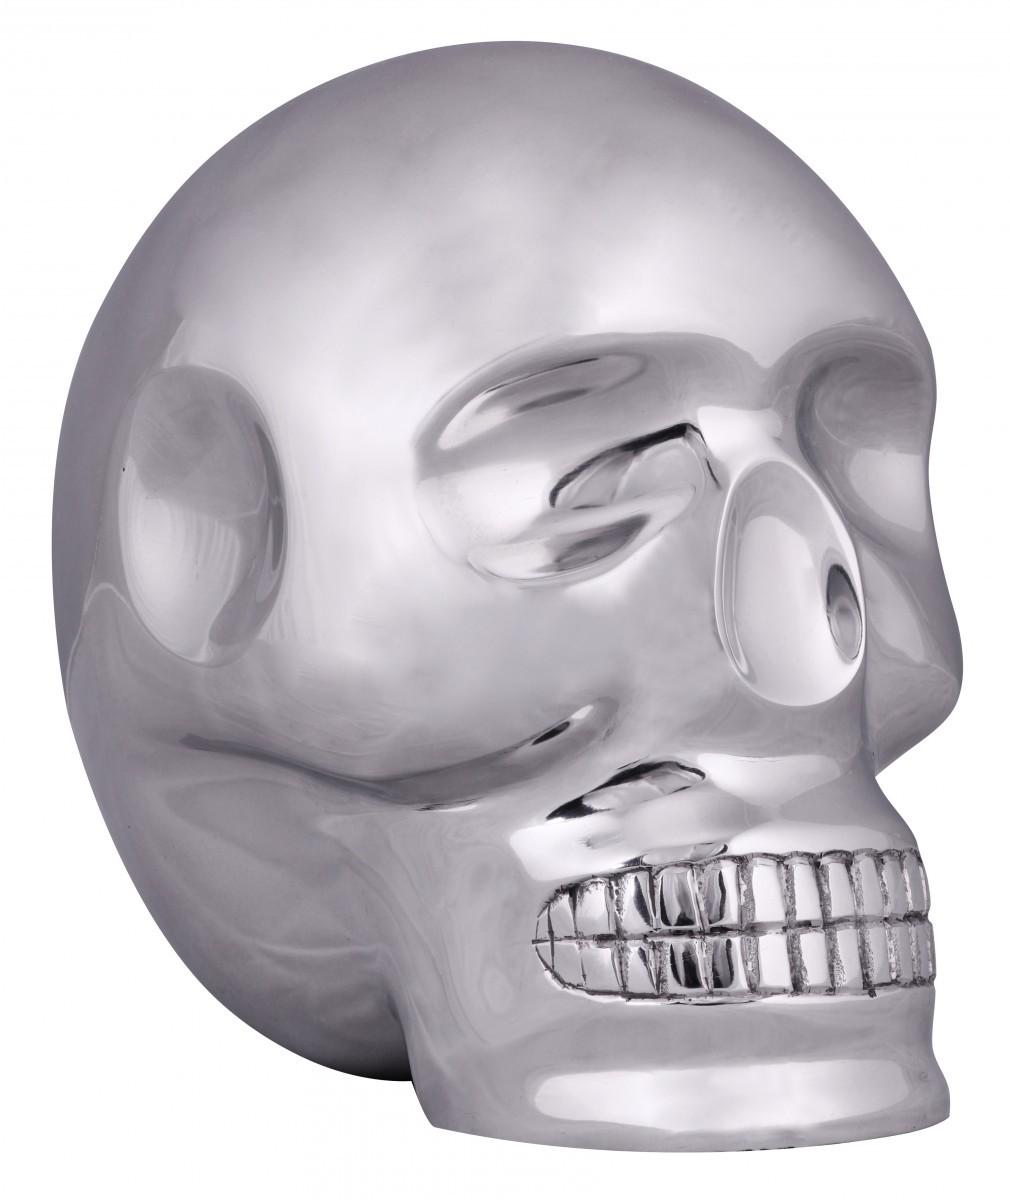 FineBuy Design XXL Deko Skull Aluminium silbern Schädel Totenkopf 36221